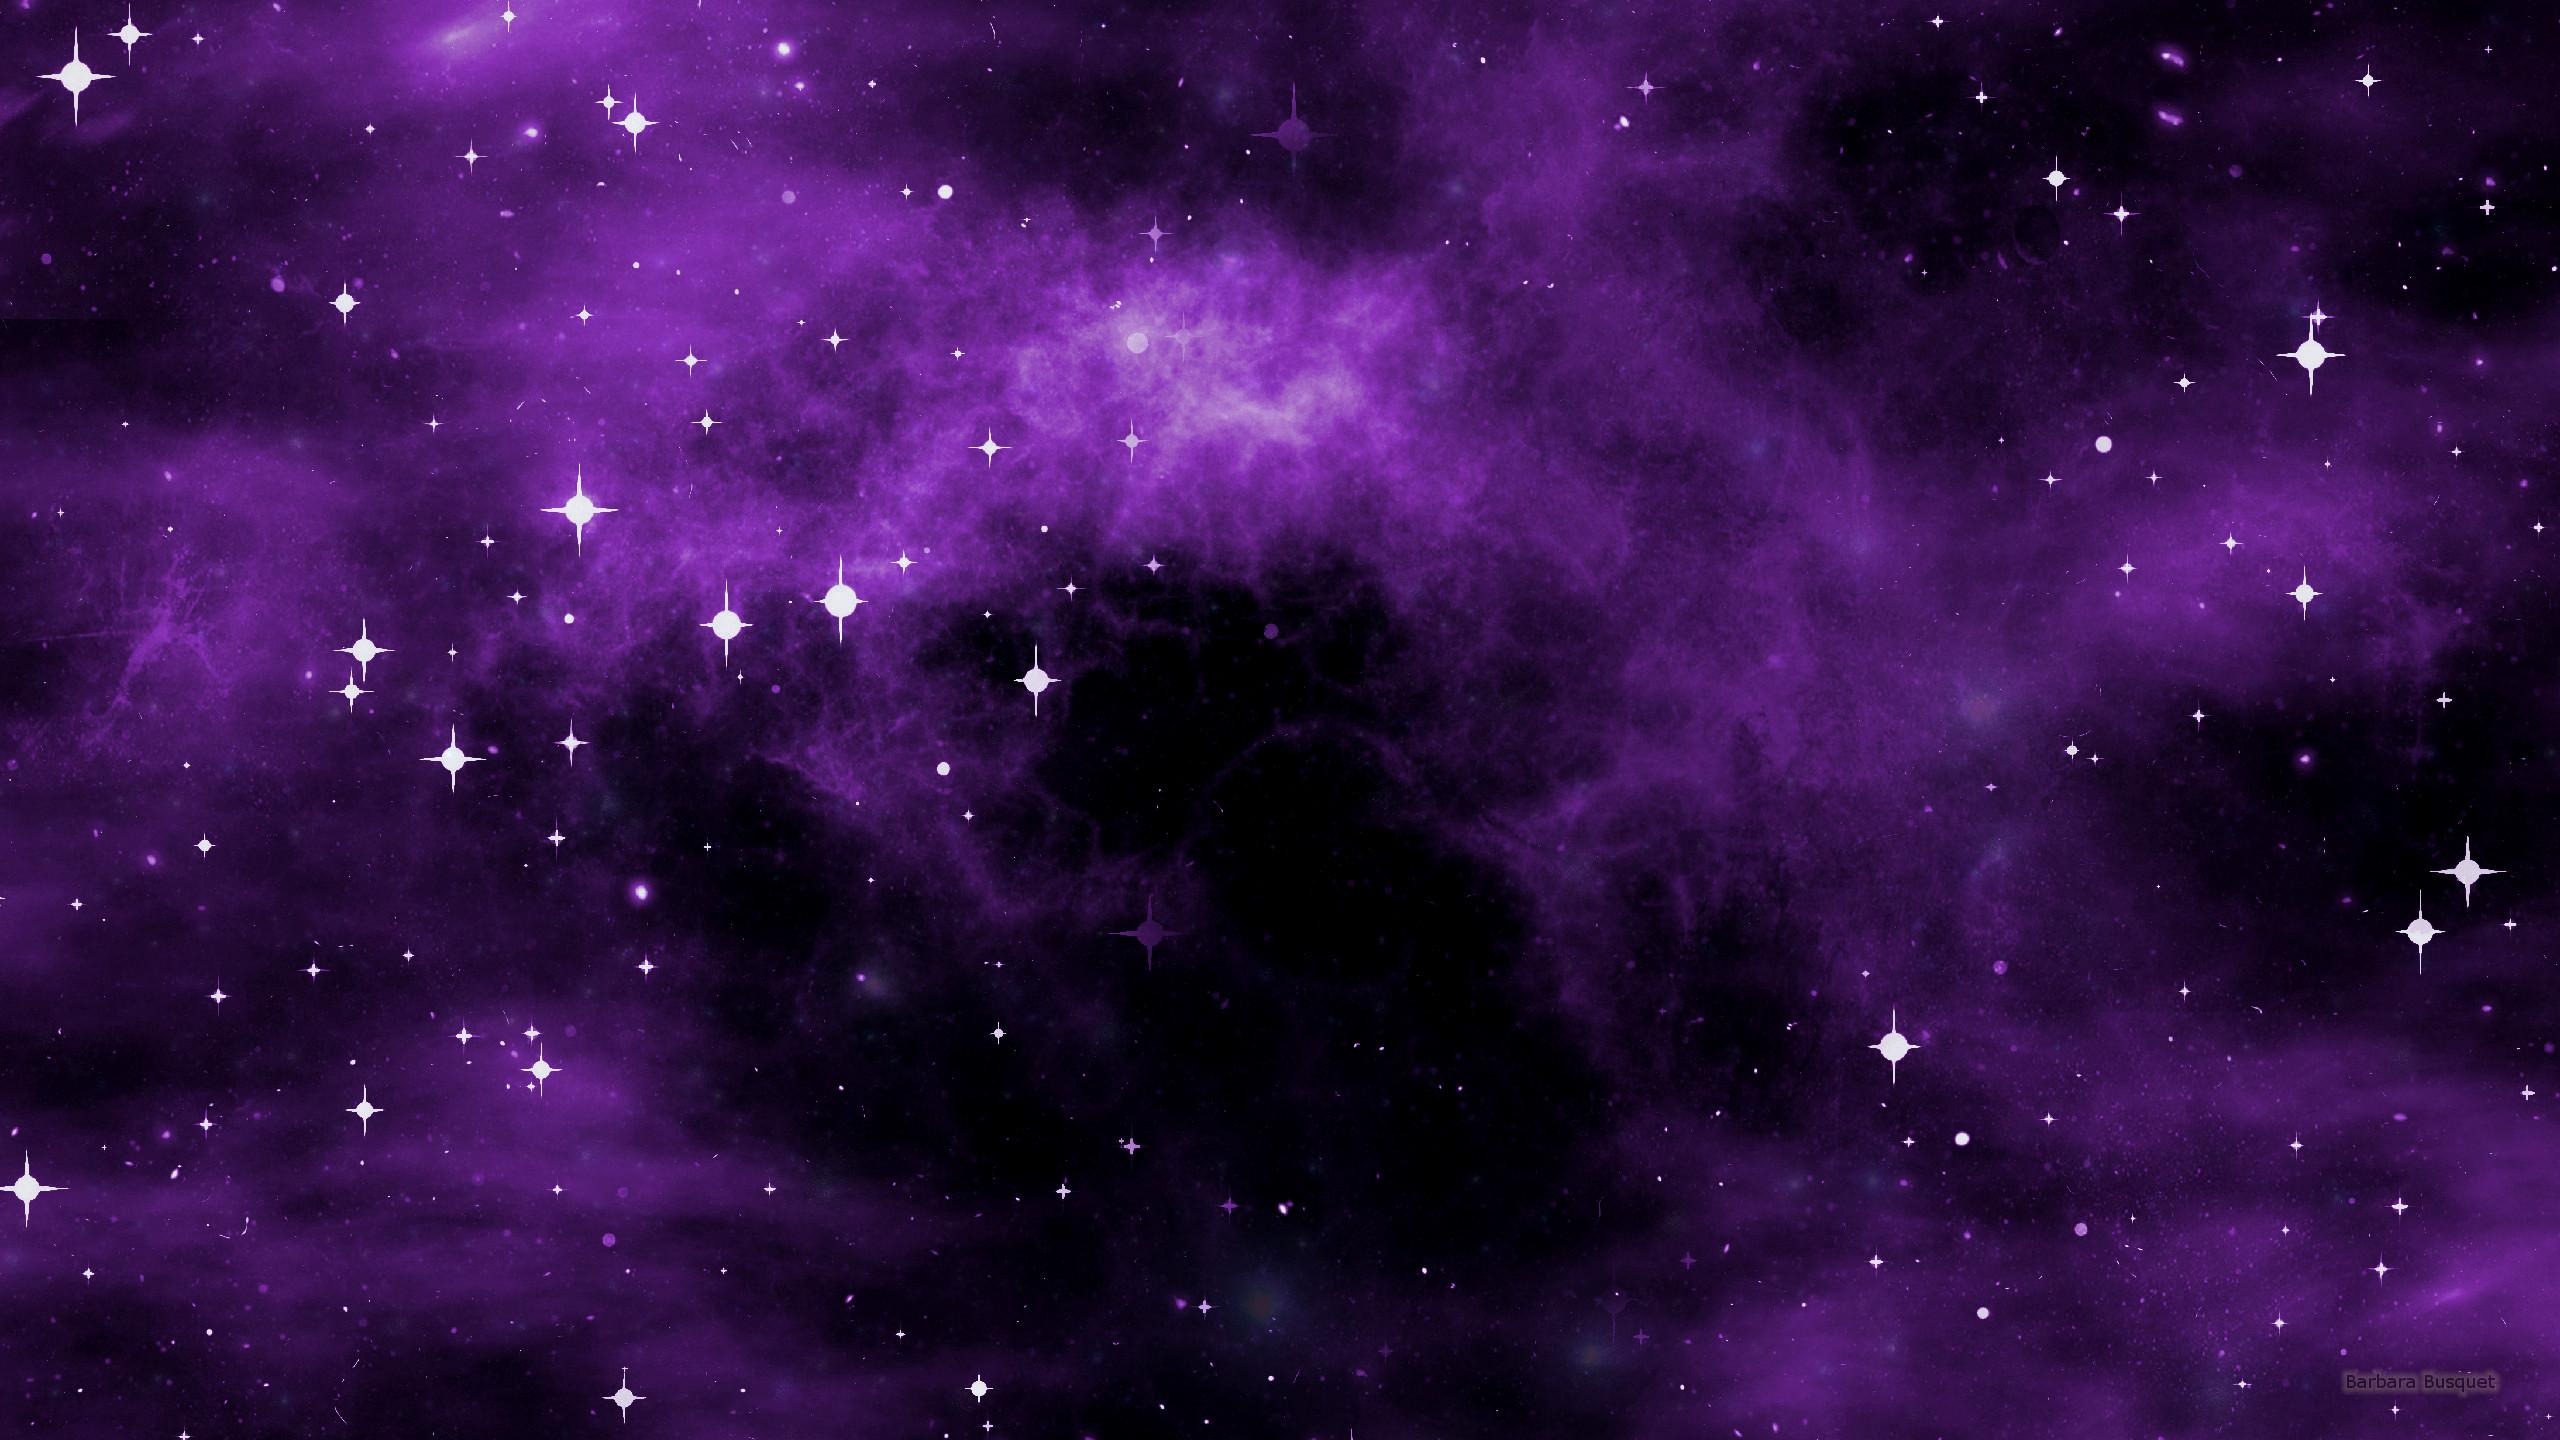 hd purple galaxy wallpaper - photo #15